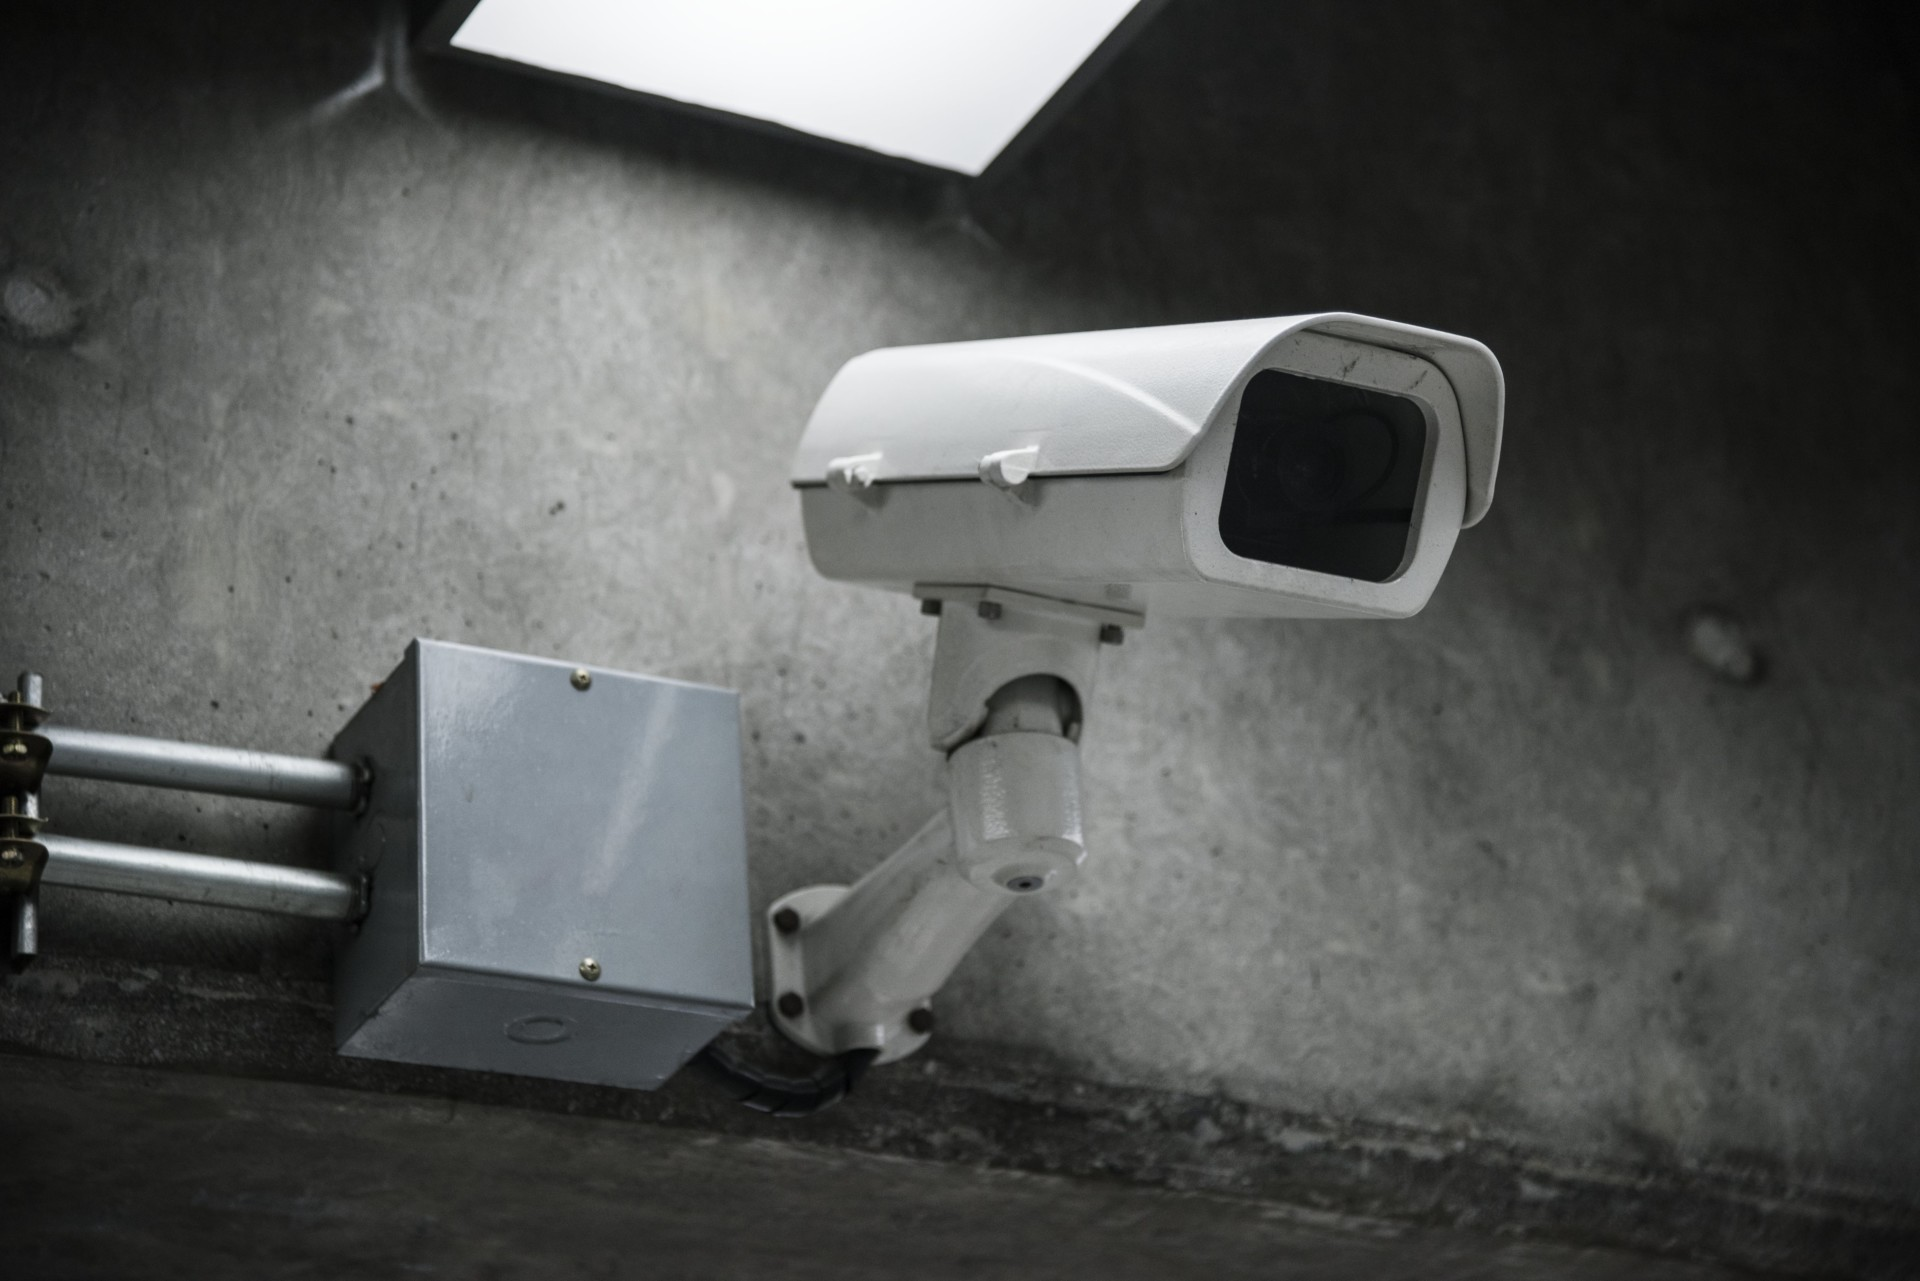 closeup-of-cctv-camera-on-the-wall-min